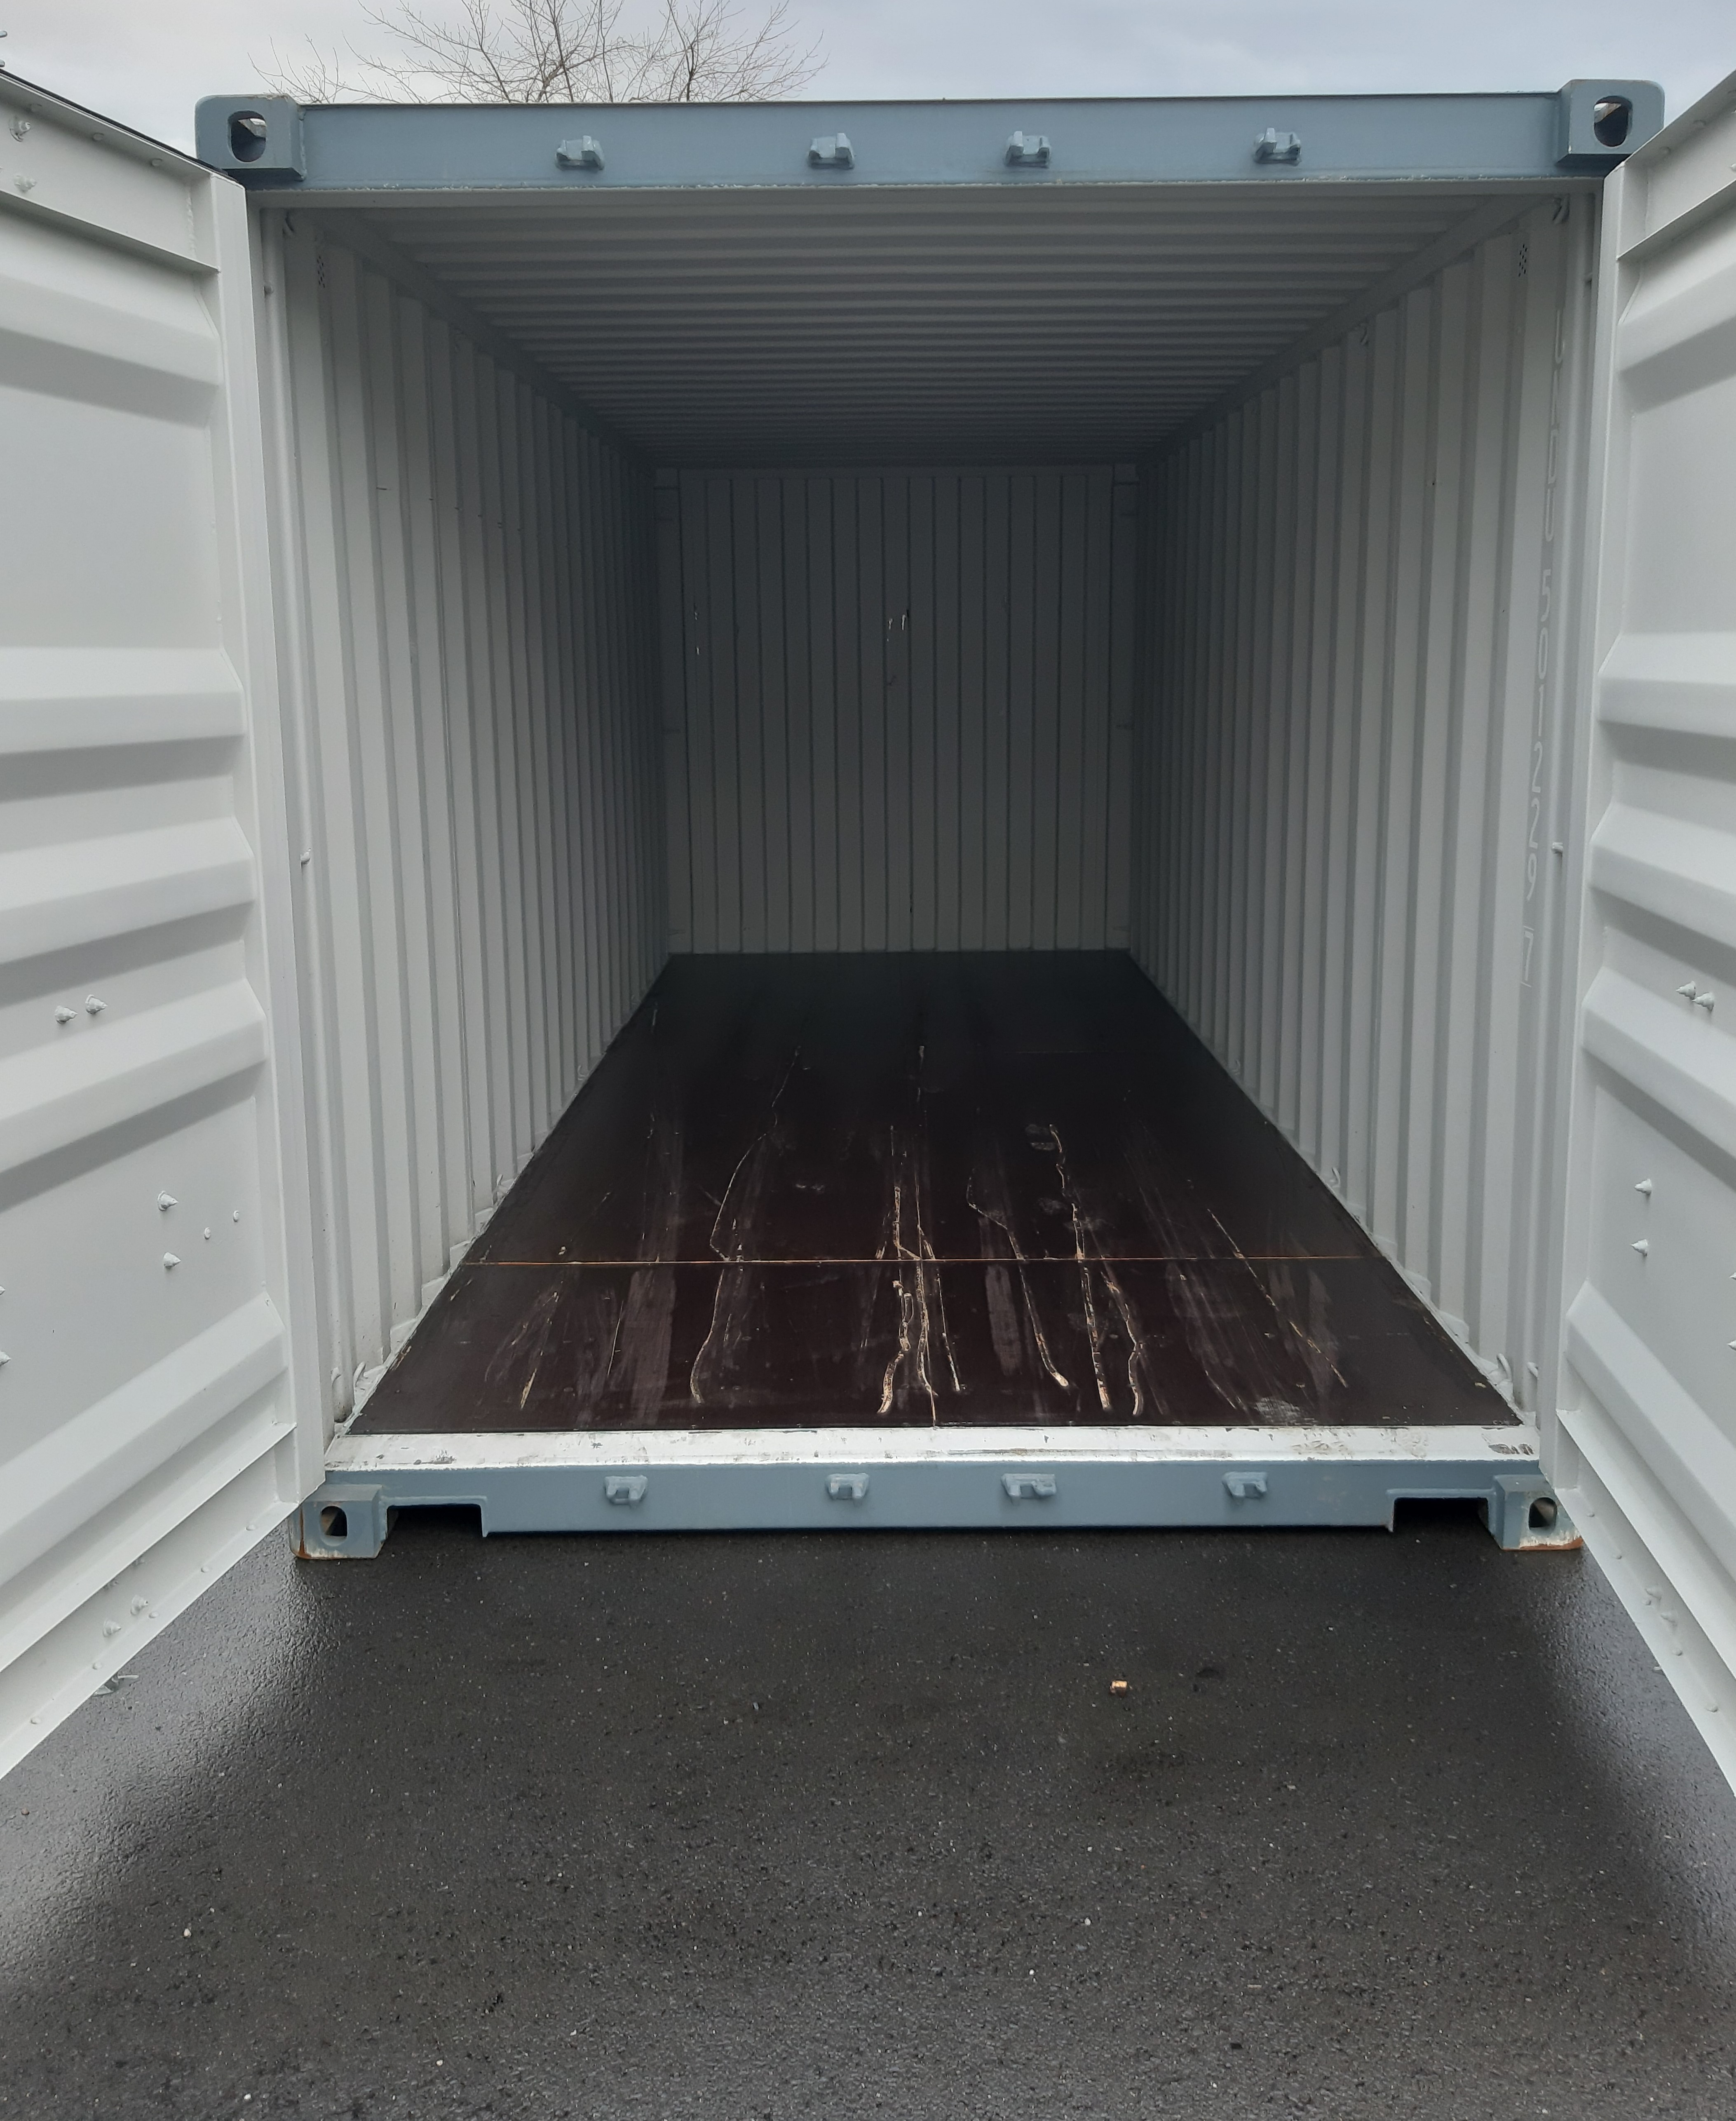 Seecontainer 20' One Way RAL 7031 Blaugrau